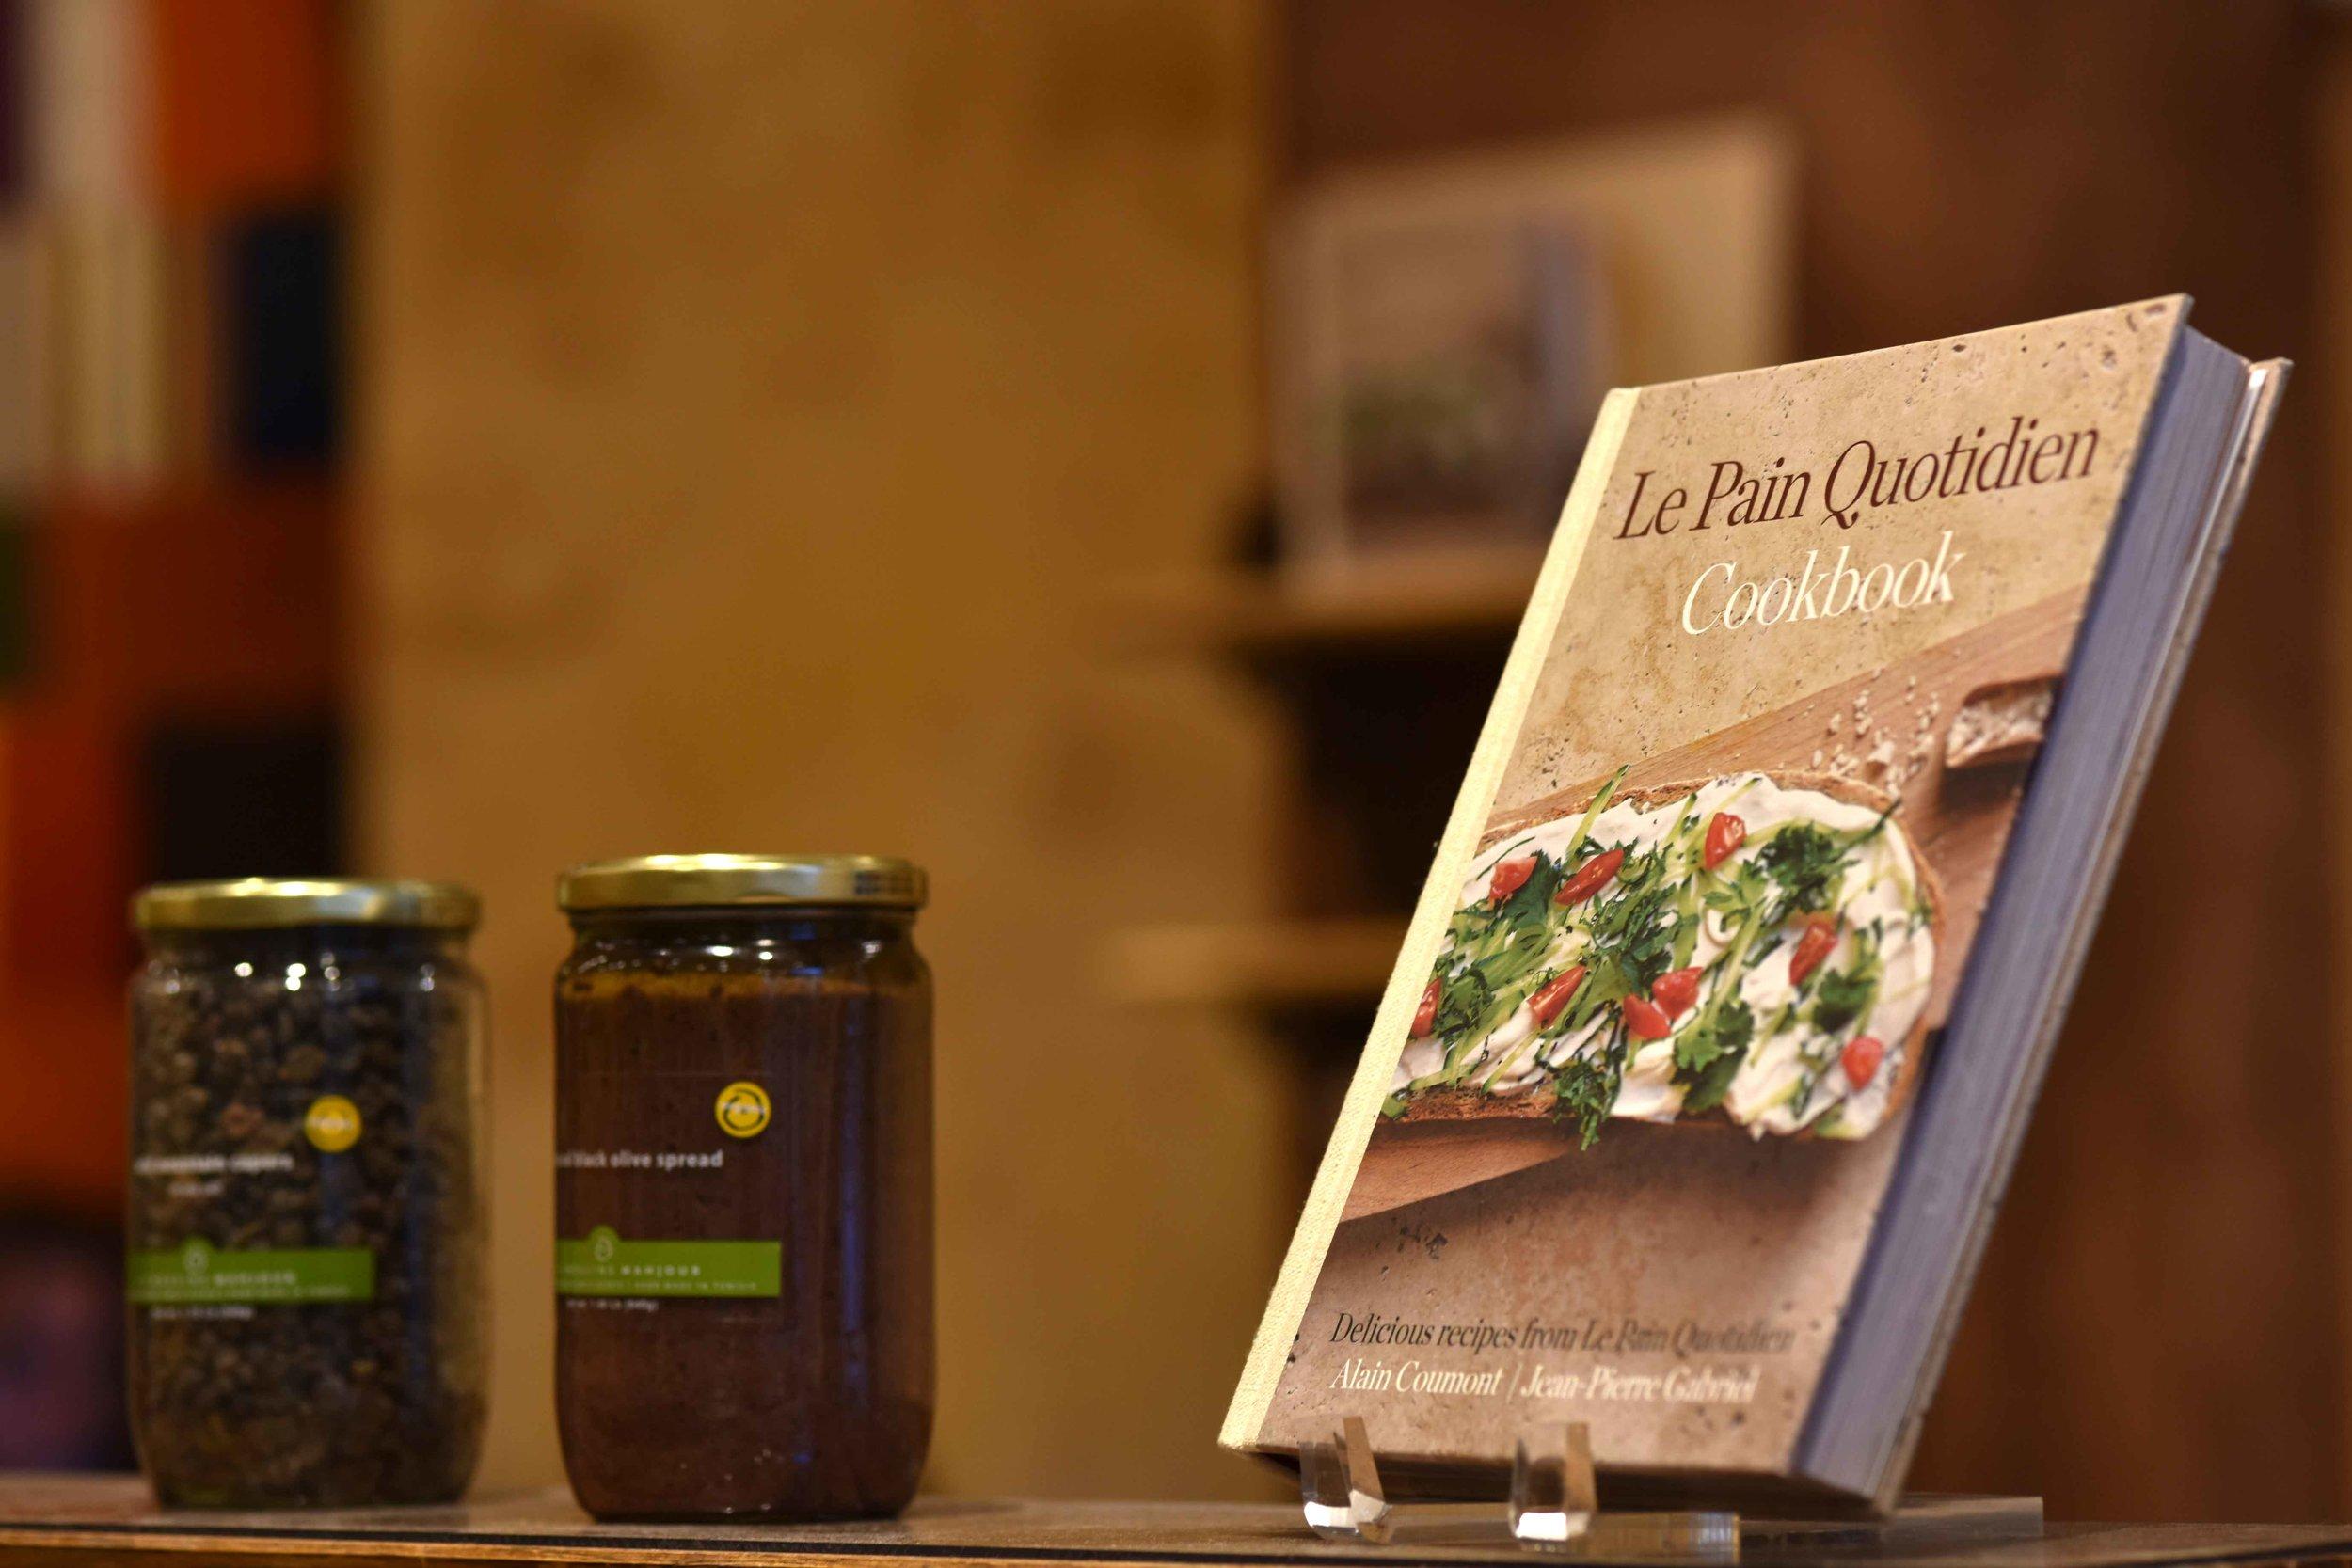 Le Pain Quotidien, Americana at Brand, Los Angeles, USA. Image©thingstodot.com